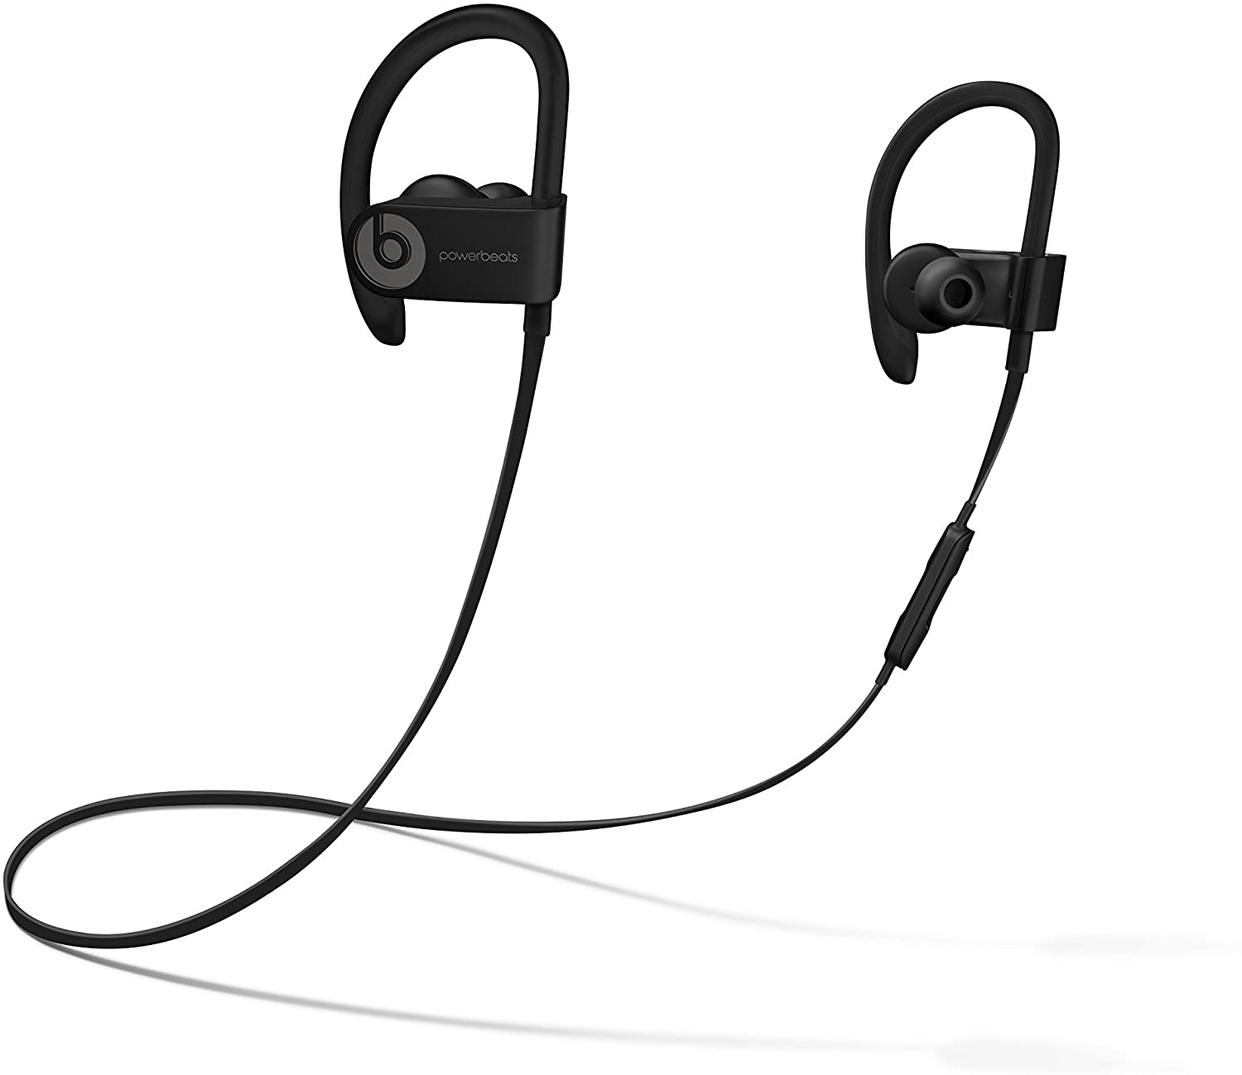 Beats by dr.dre(ビーツバイドクタードレー) Powerbeats3 Wireless ML8V2PA/Aの商品画像